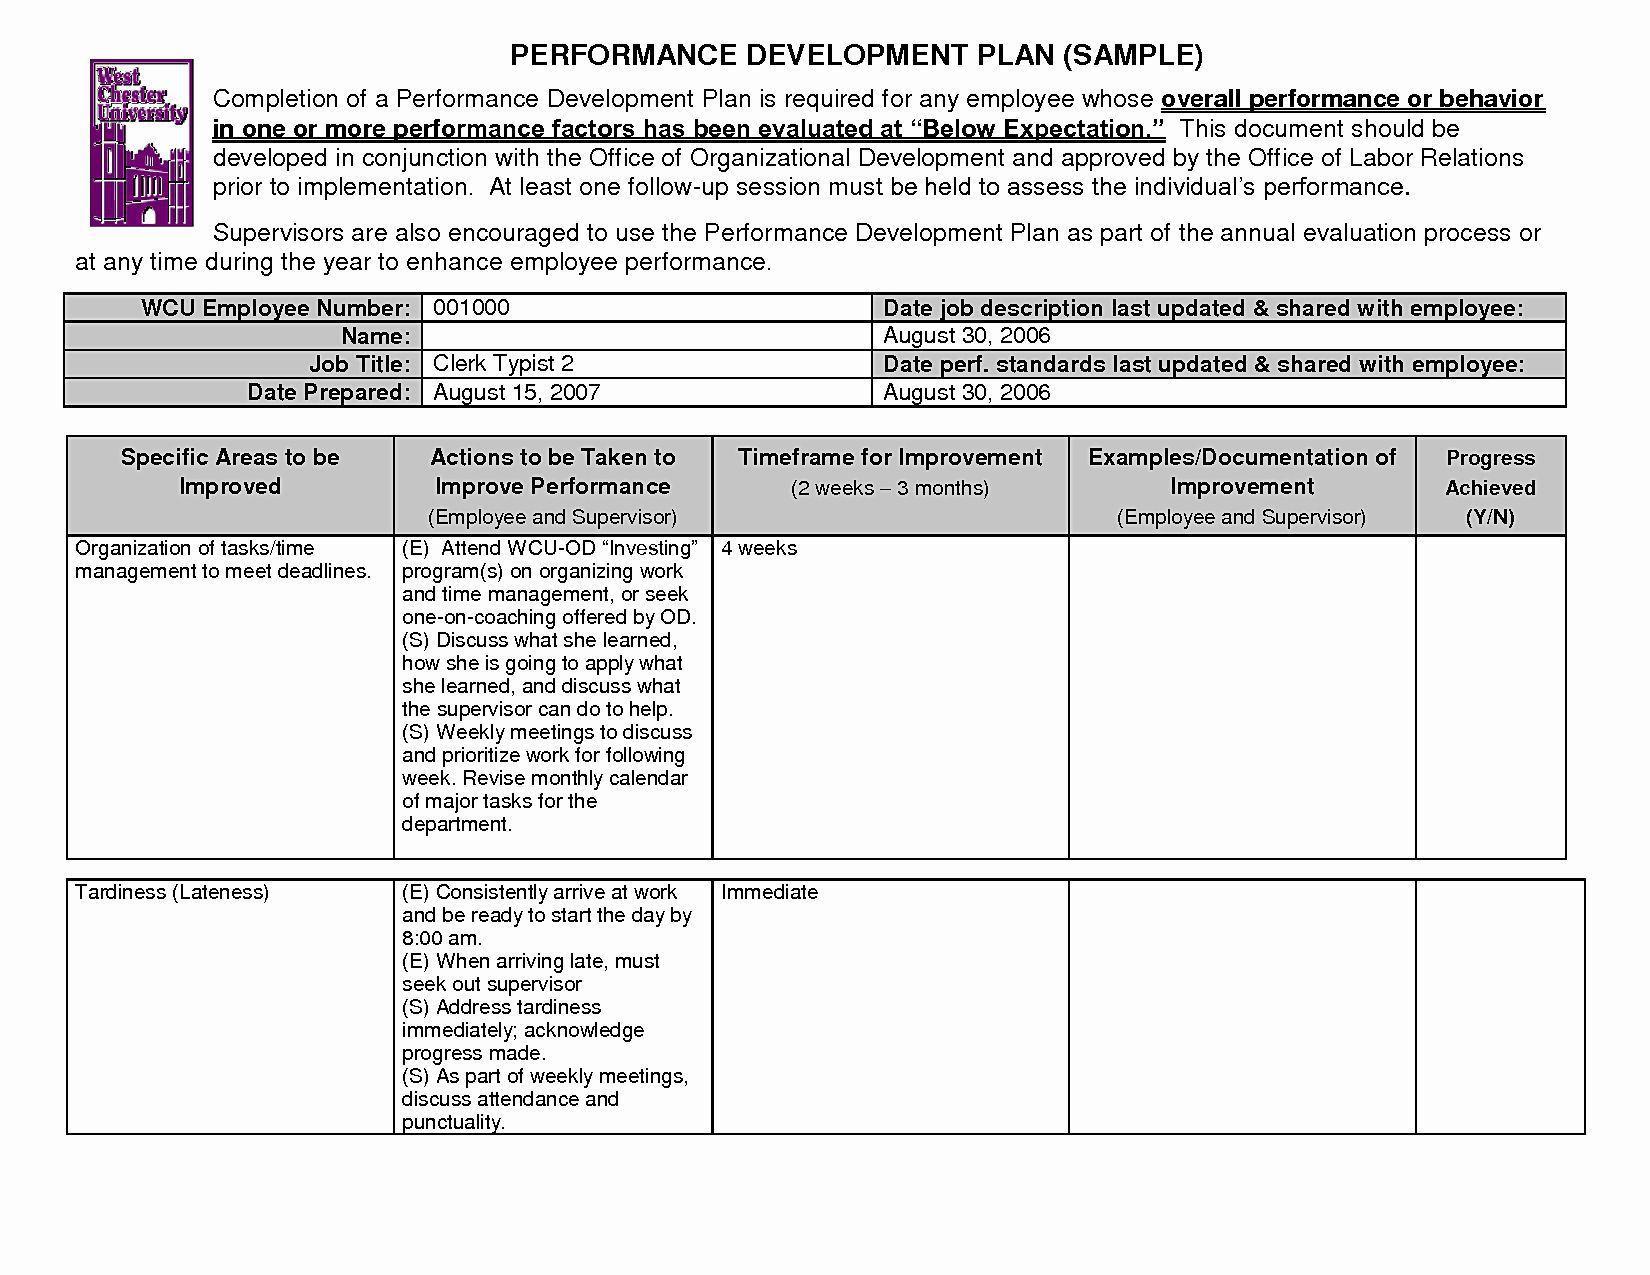 006 Best Employee Development Plan Example High Definition  Workforce Personal CareerFull